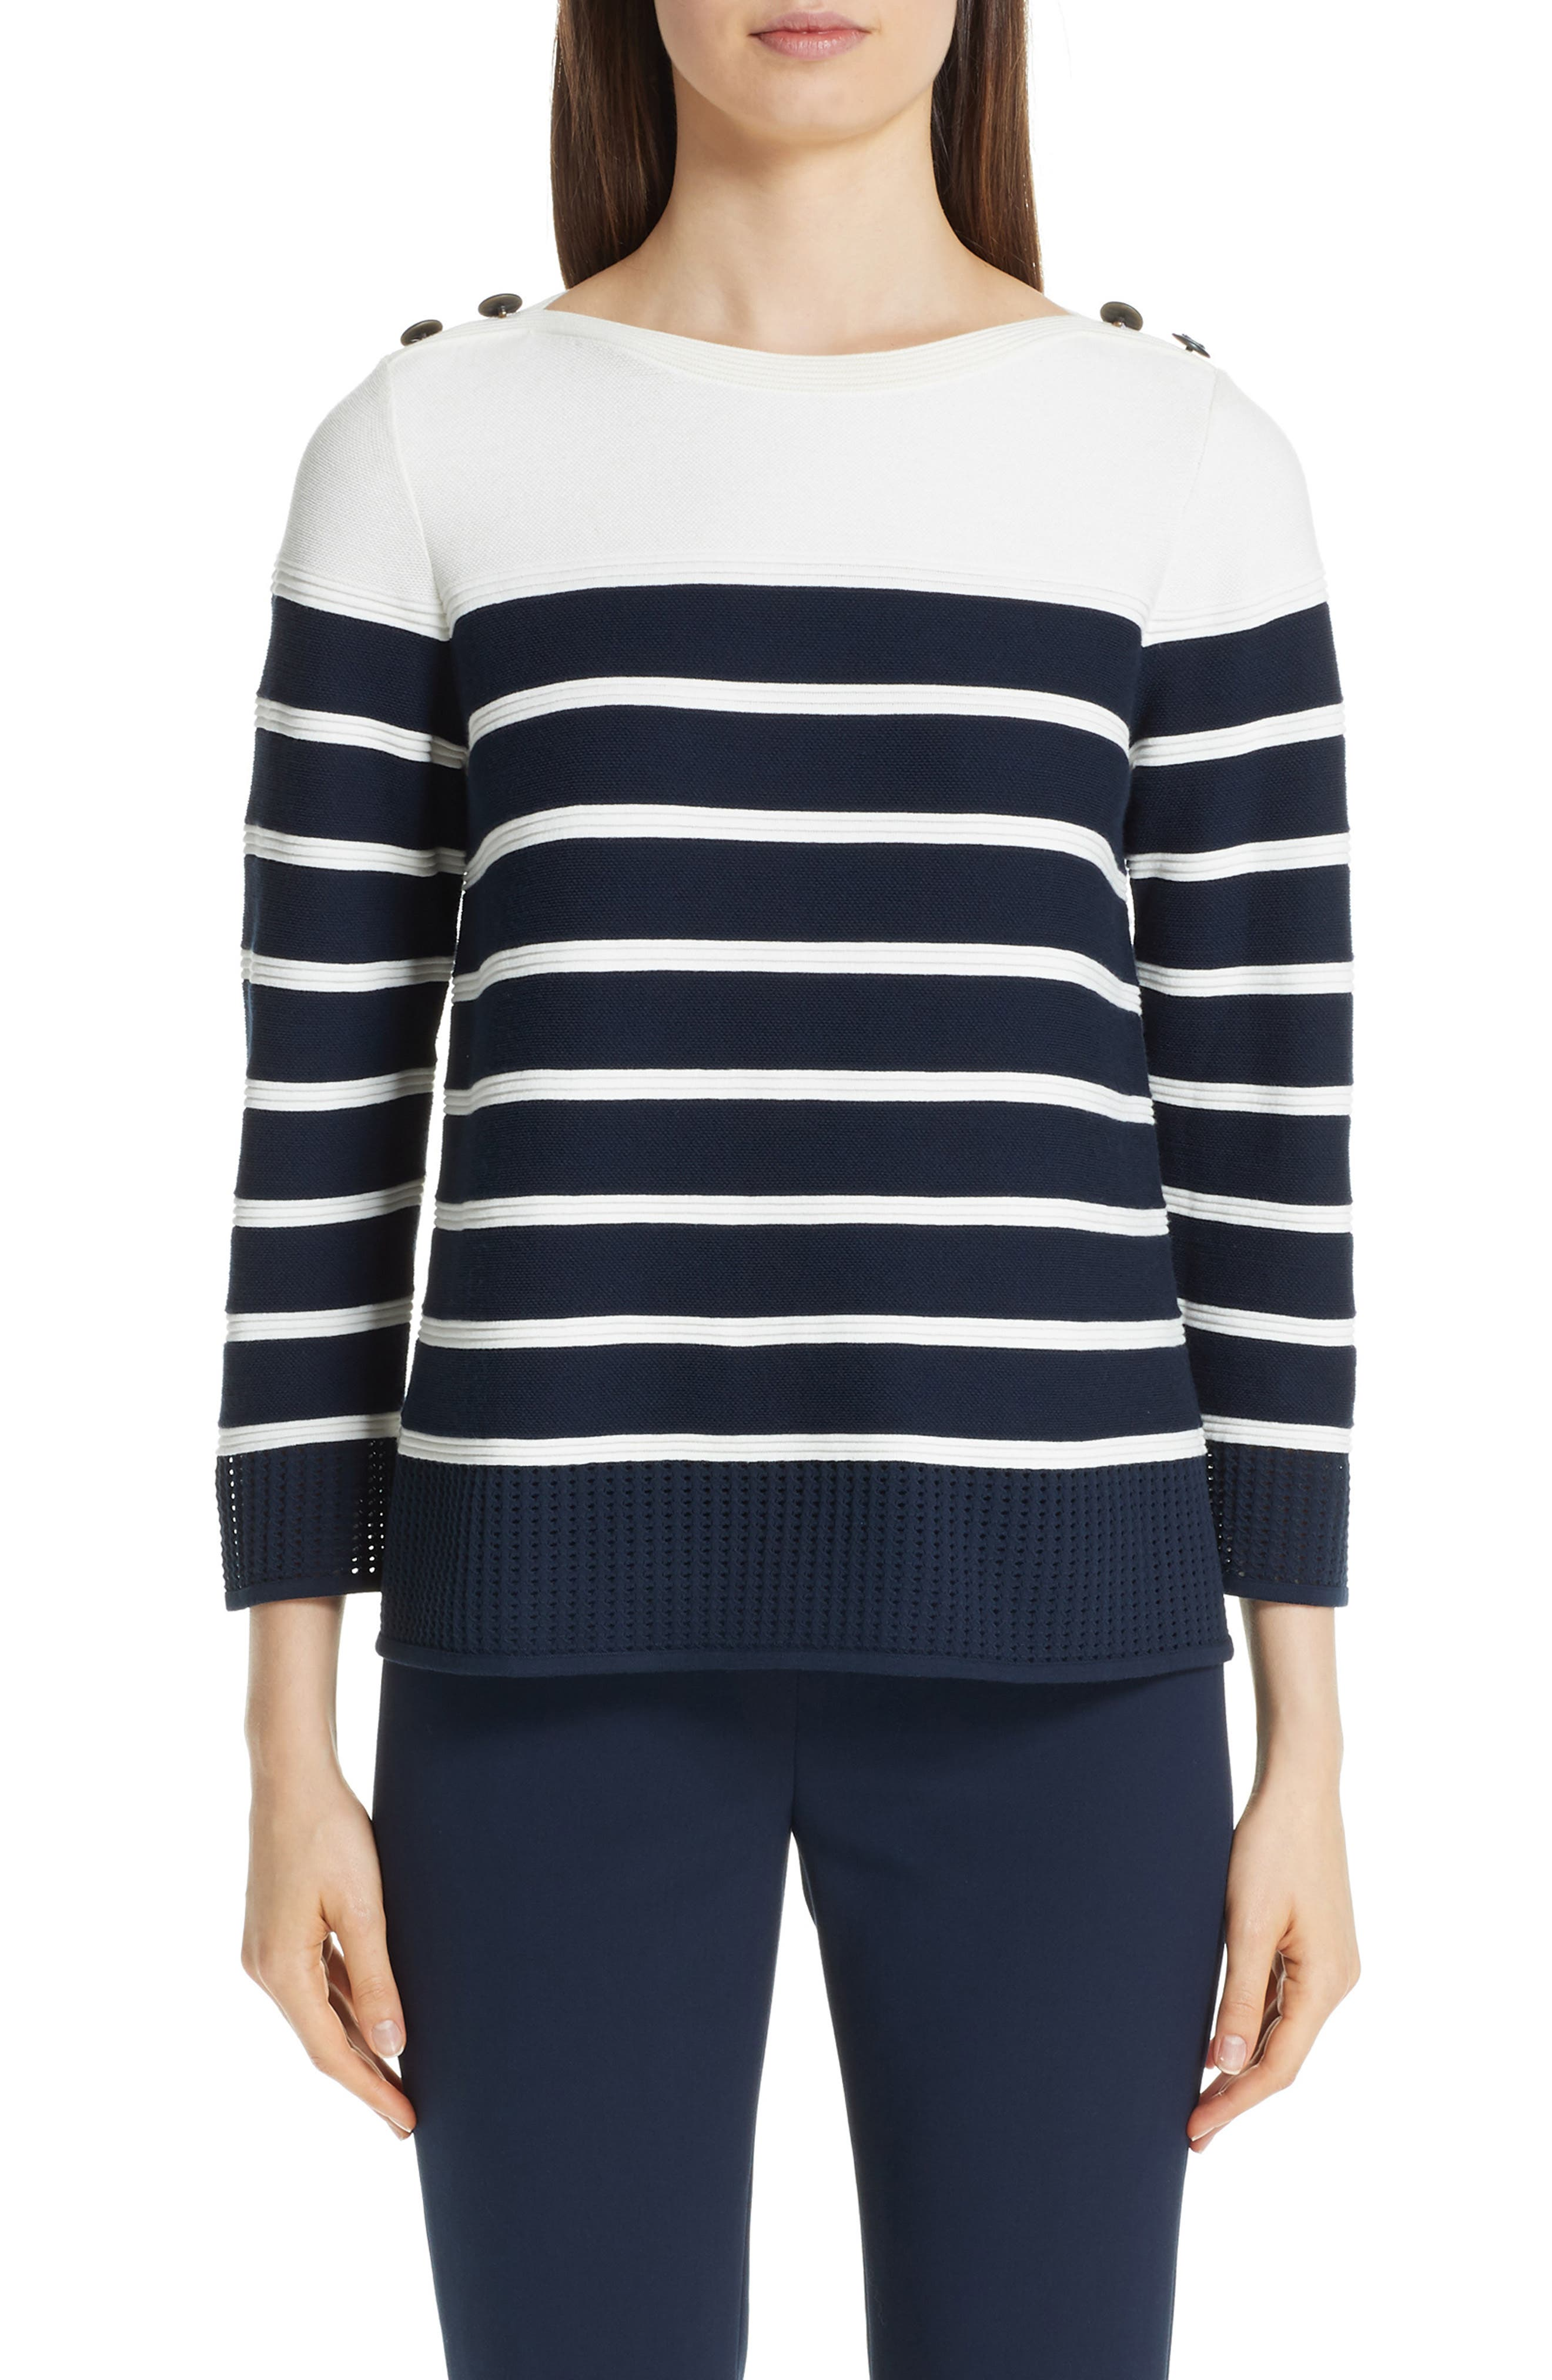 Boat-Neck Birdseye Mesh Knit Colorblock Striped Sweater in Cream/ Navy